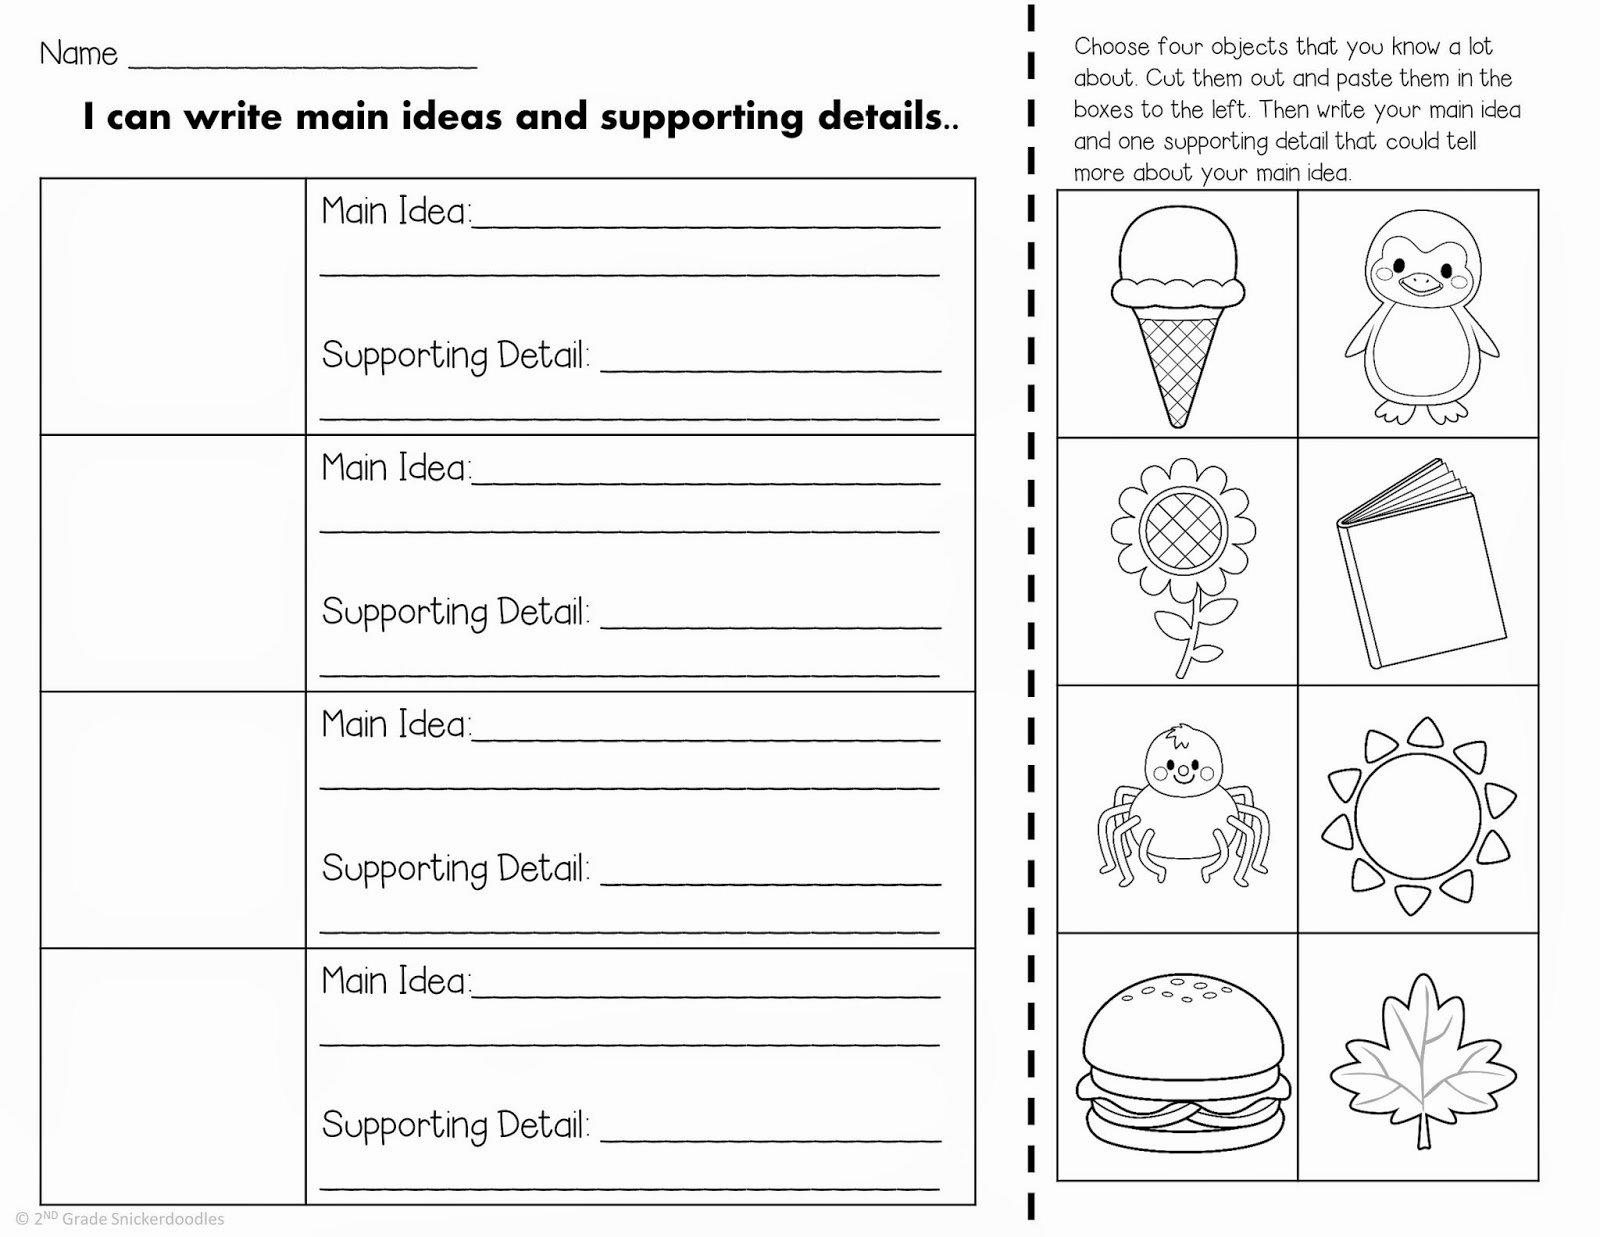 50 Main Idea Worksheet 2nd Grade